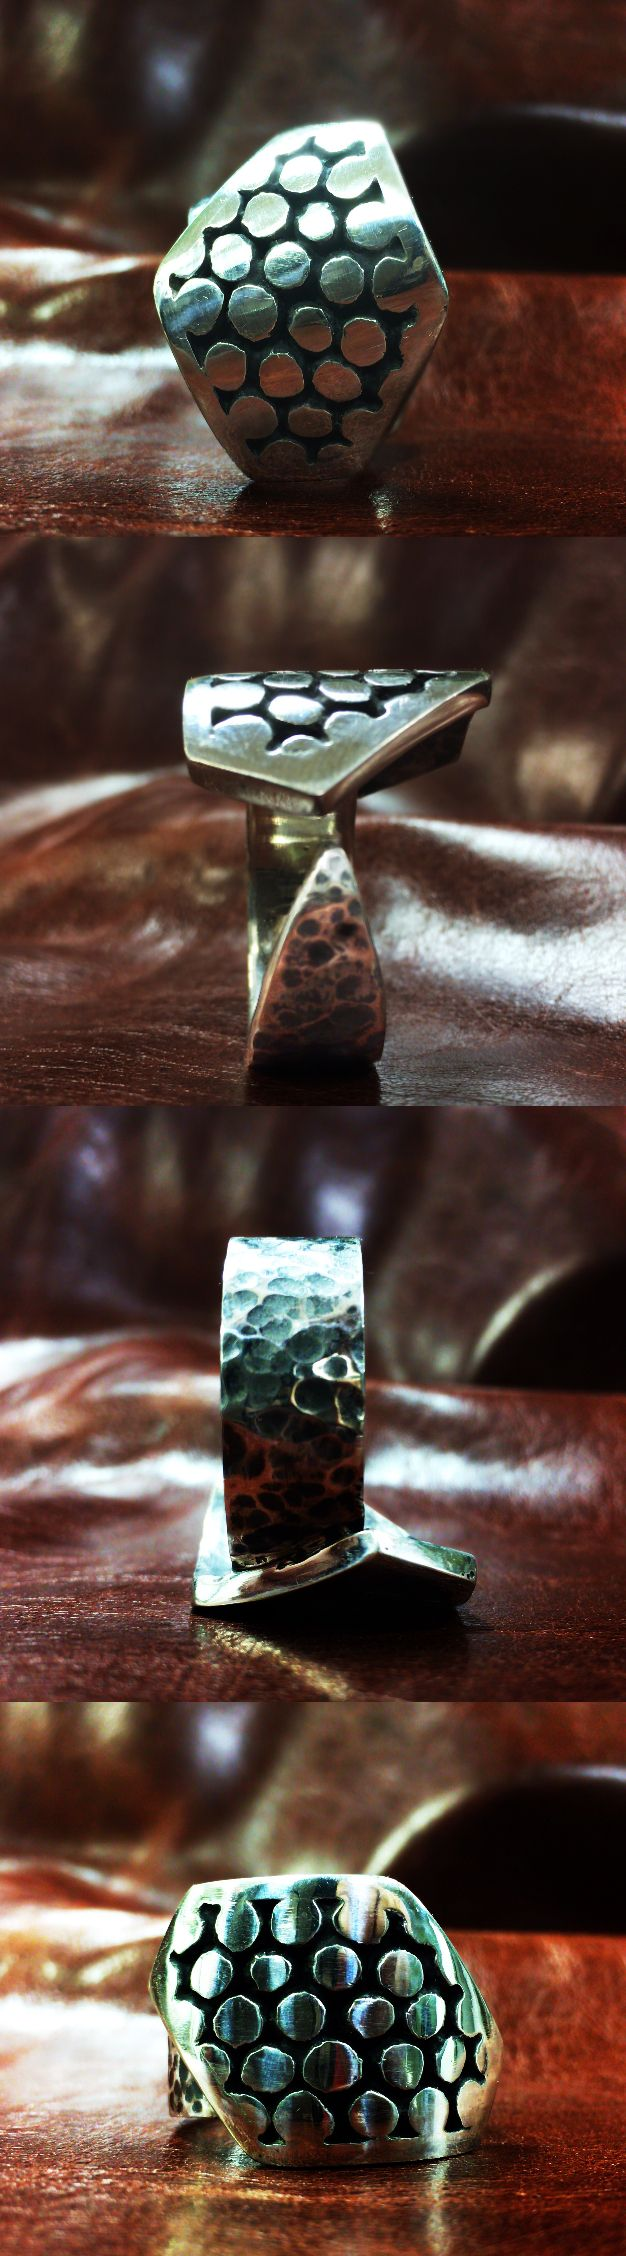 Cosmopolitan Sterling Silver geometric studded ring for men by 969 Design Studio.